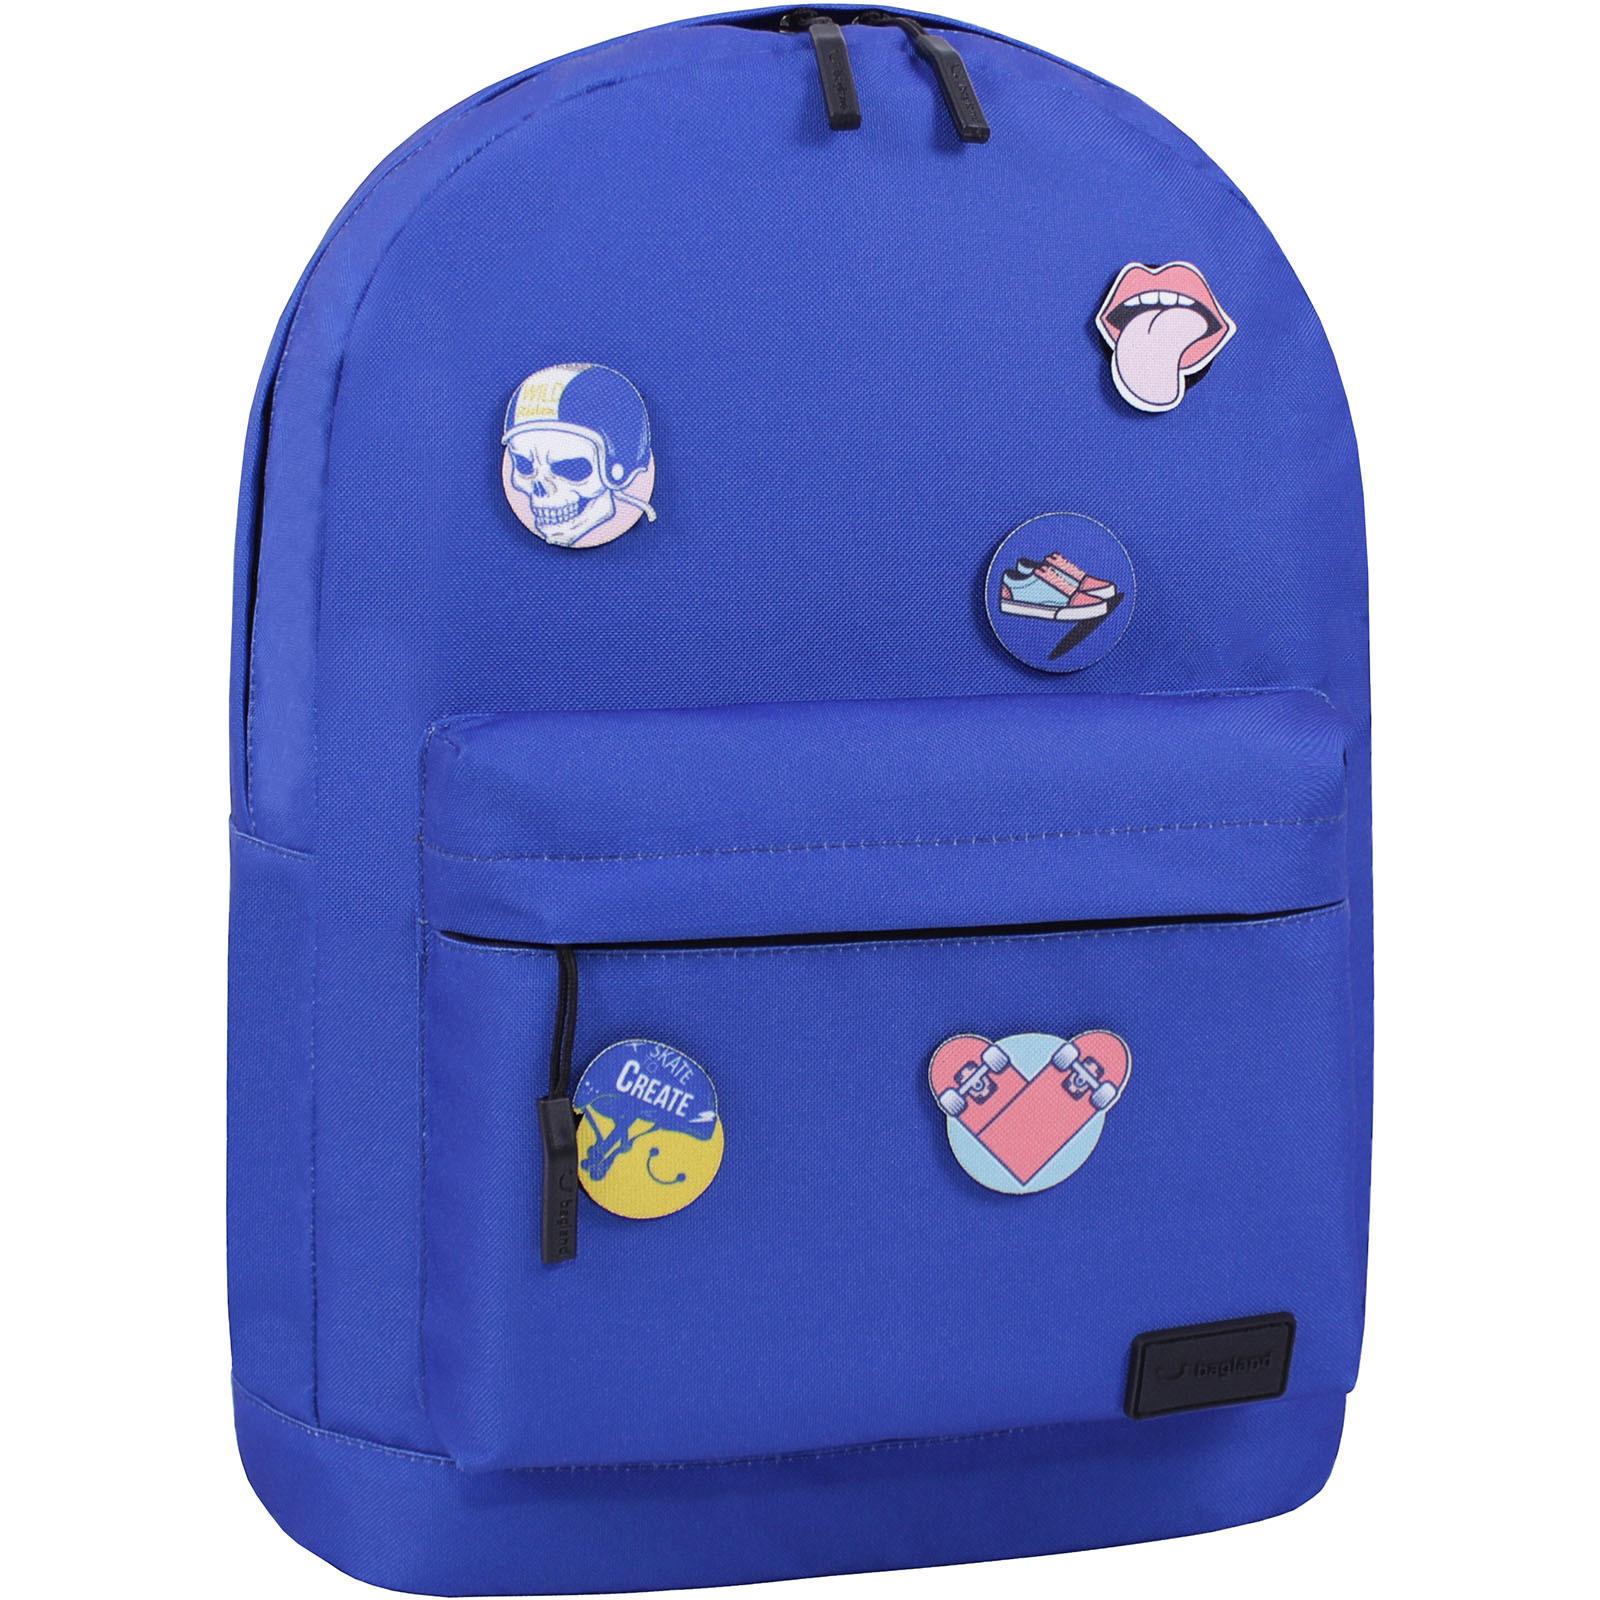 Молодежные рюкзаки Рюкзак Bagland Молодежный W/R 17 л. Синий (00533664 Ш) IMG_1382.JPG